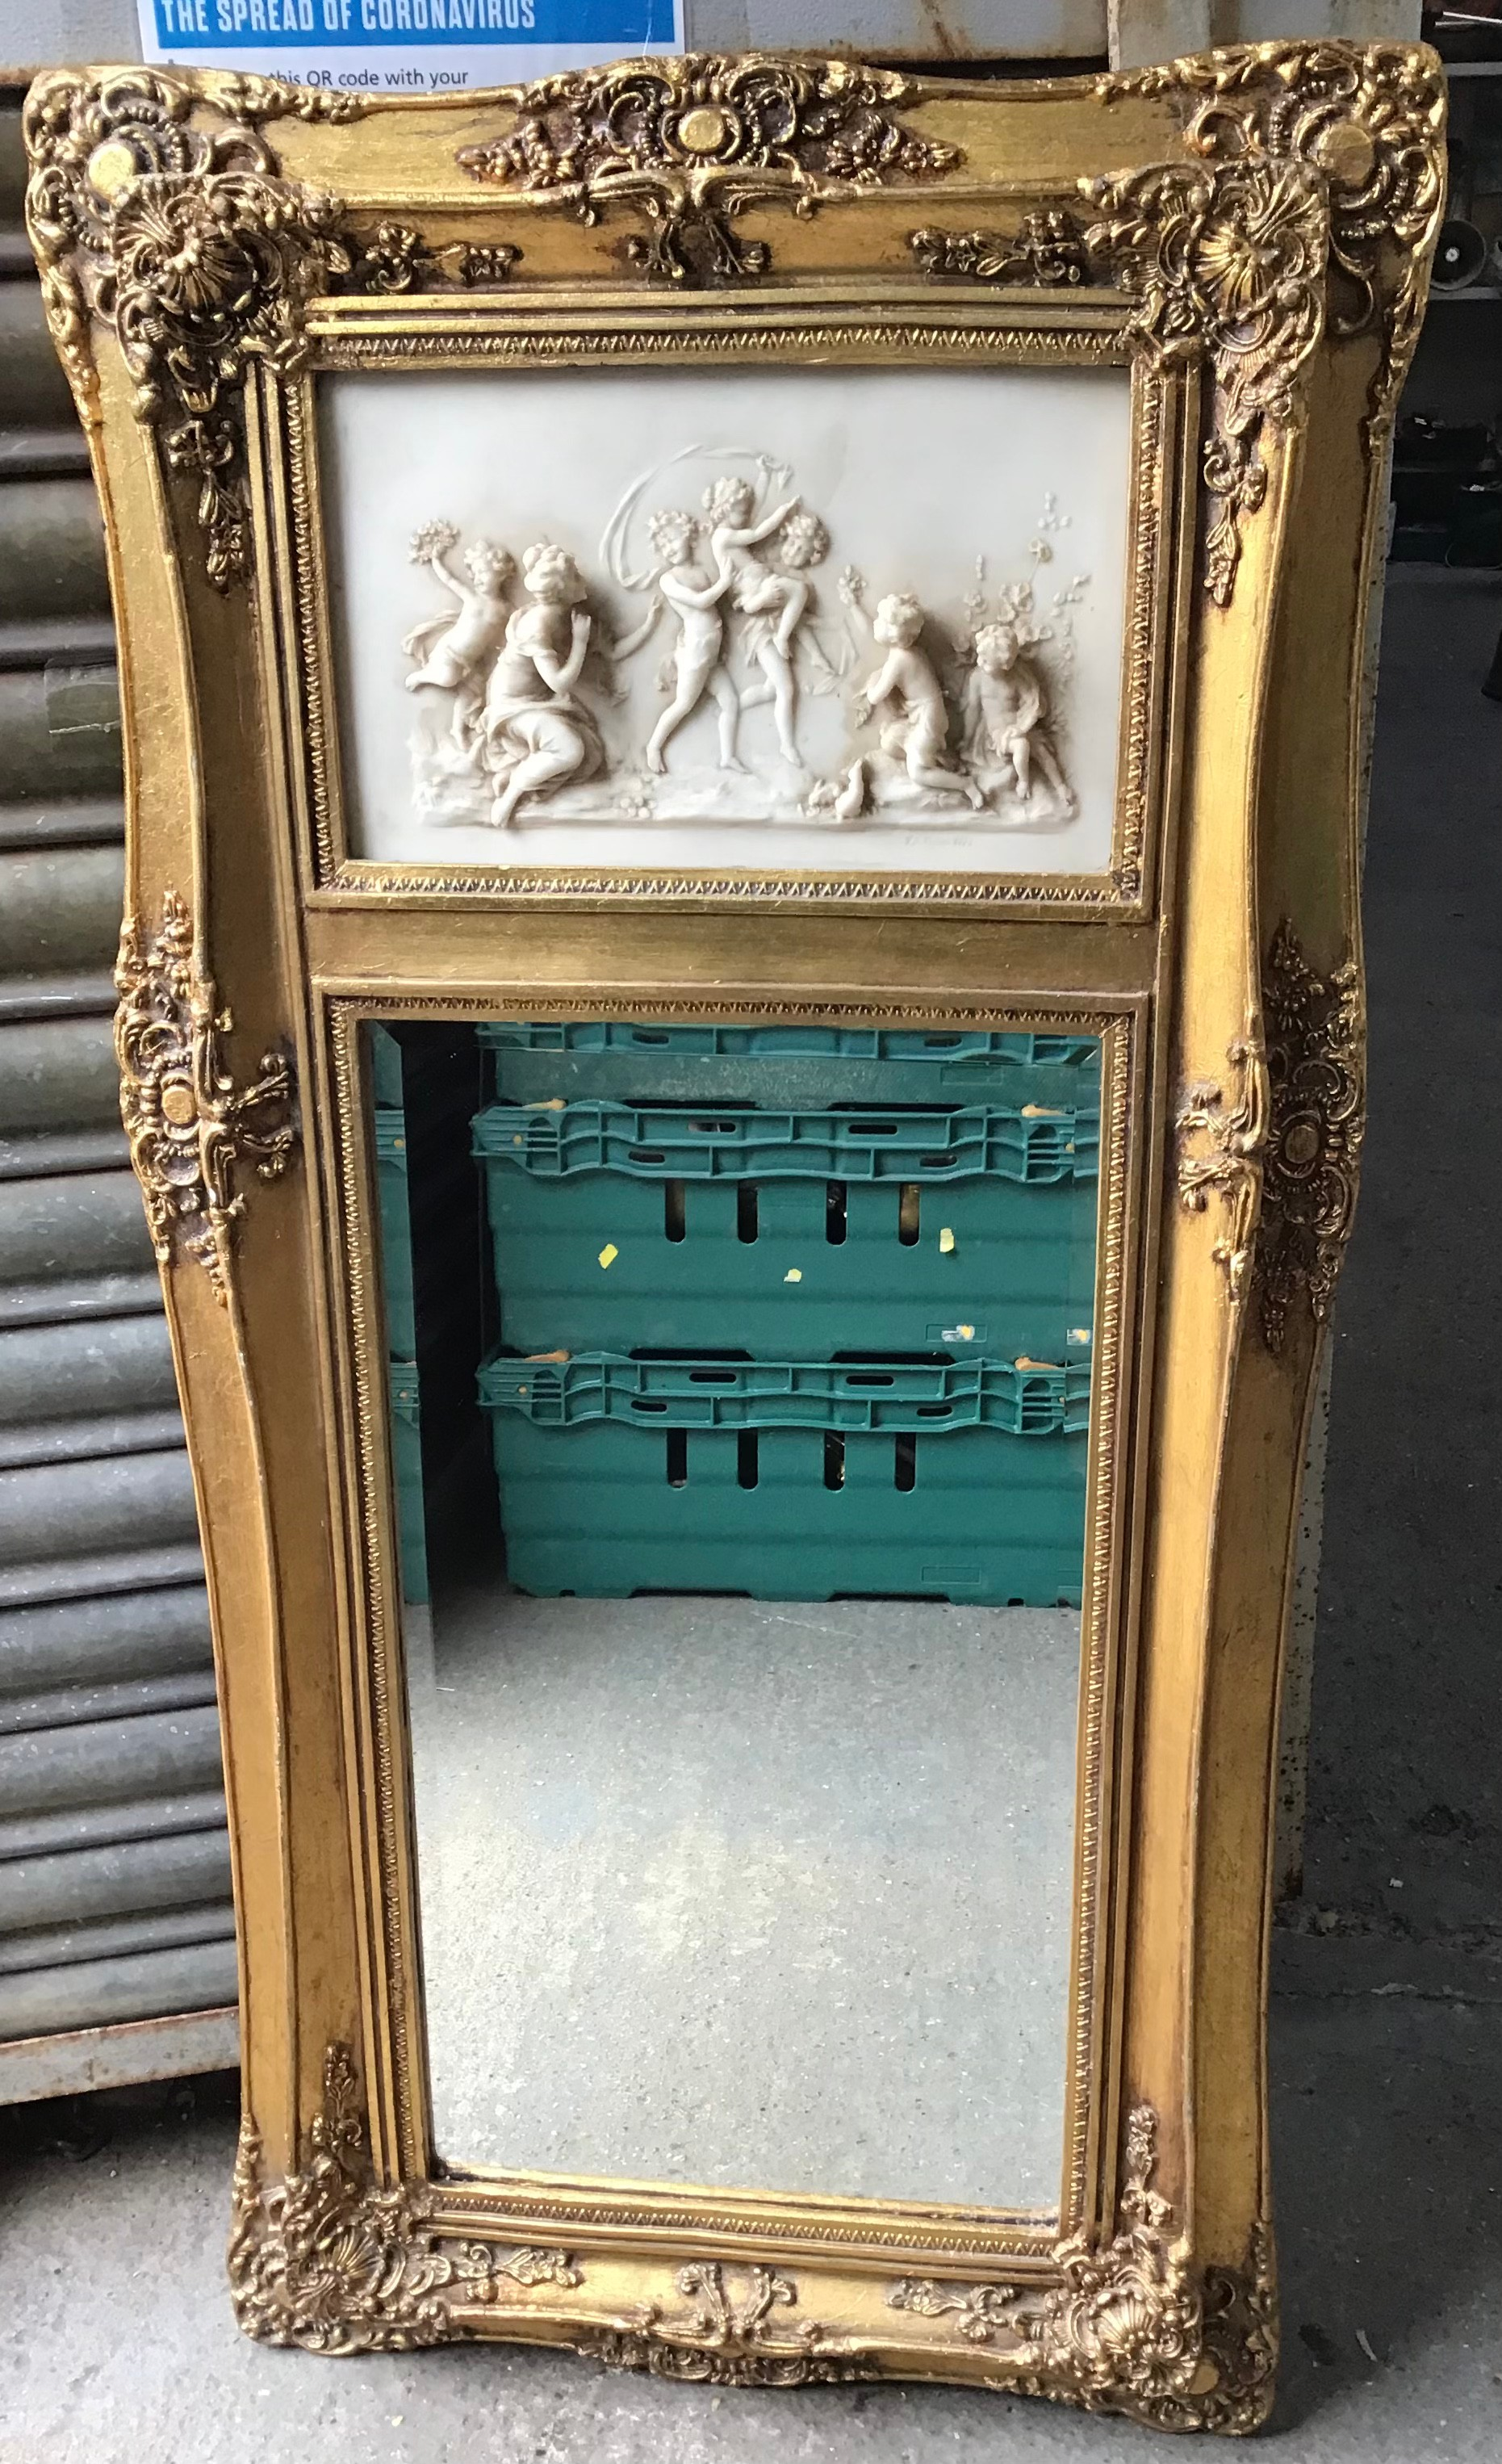 Vintage Gilt Ornately Framed Mirror - 52cm W x 108cm H